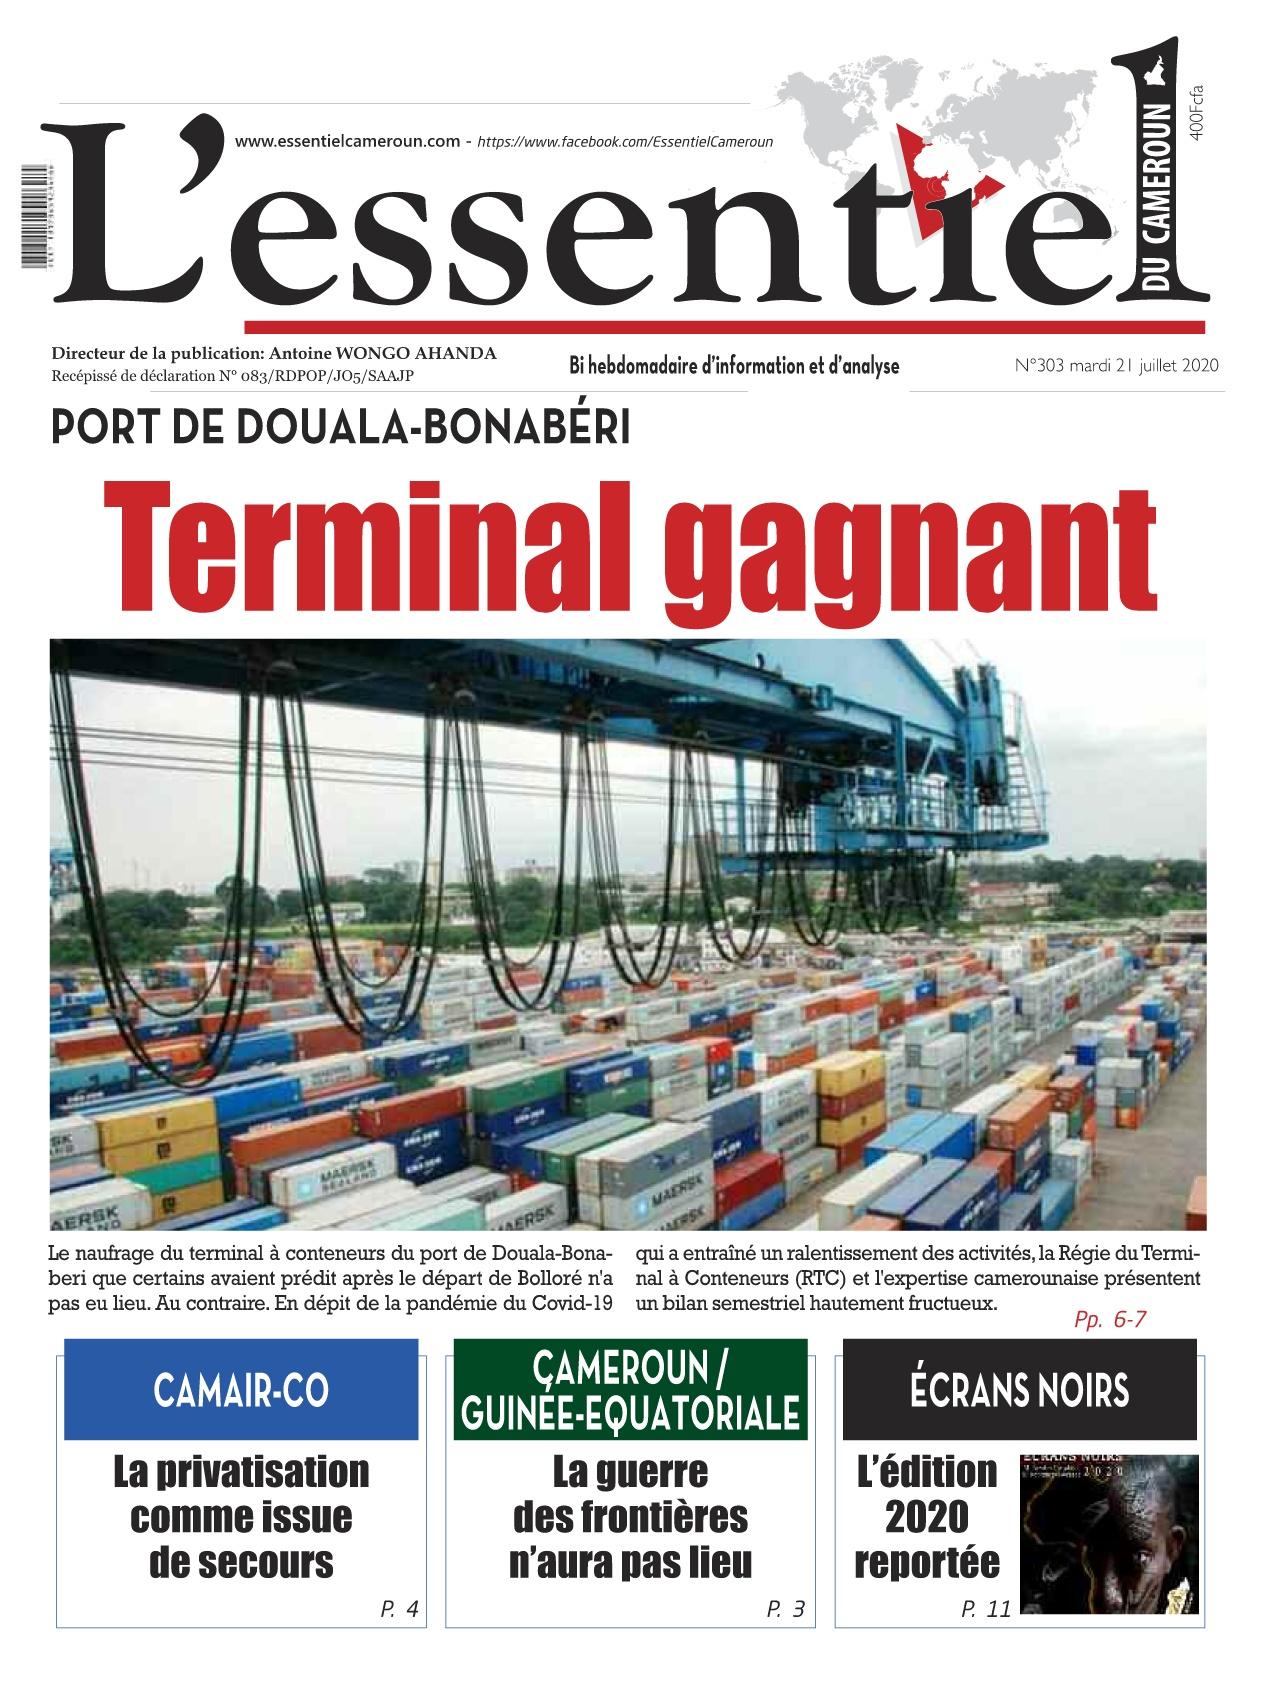 L'essentiel du Cameroun - 21/07/2020